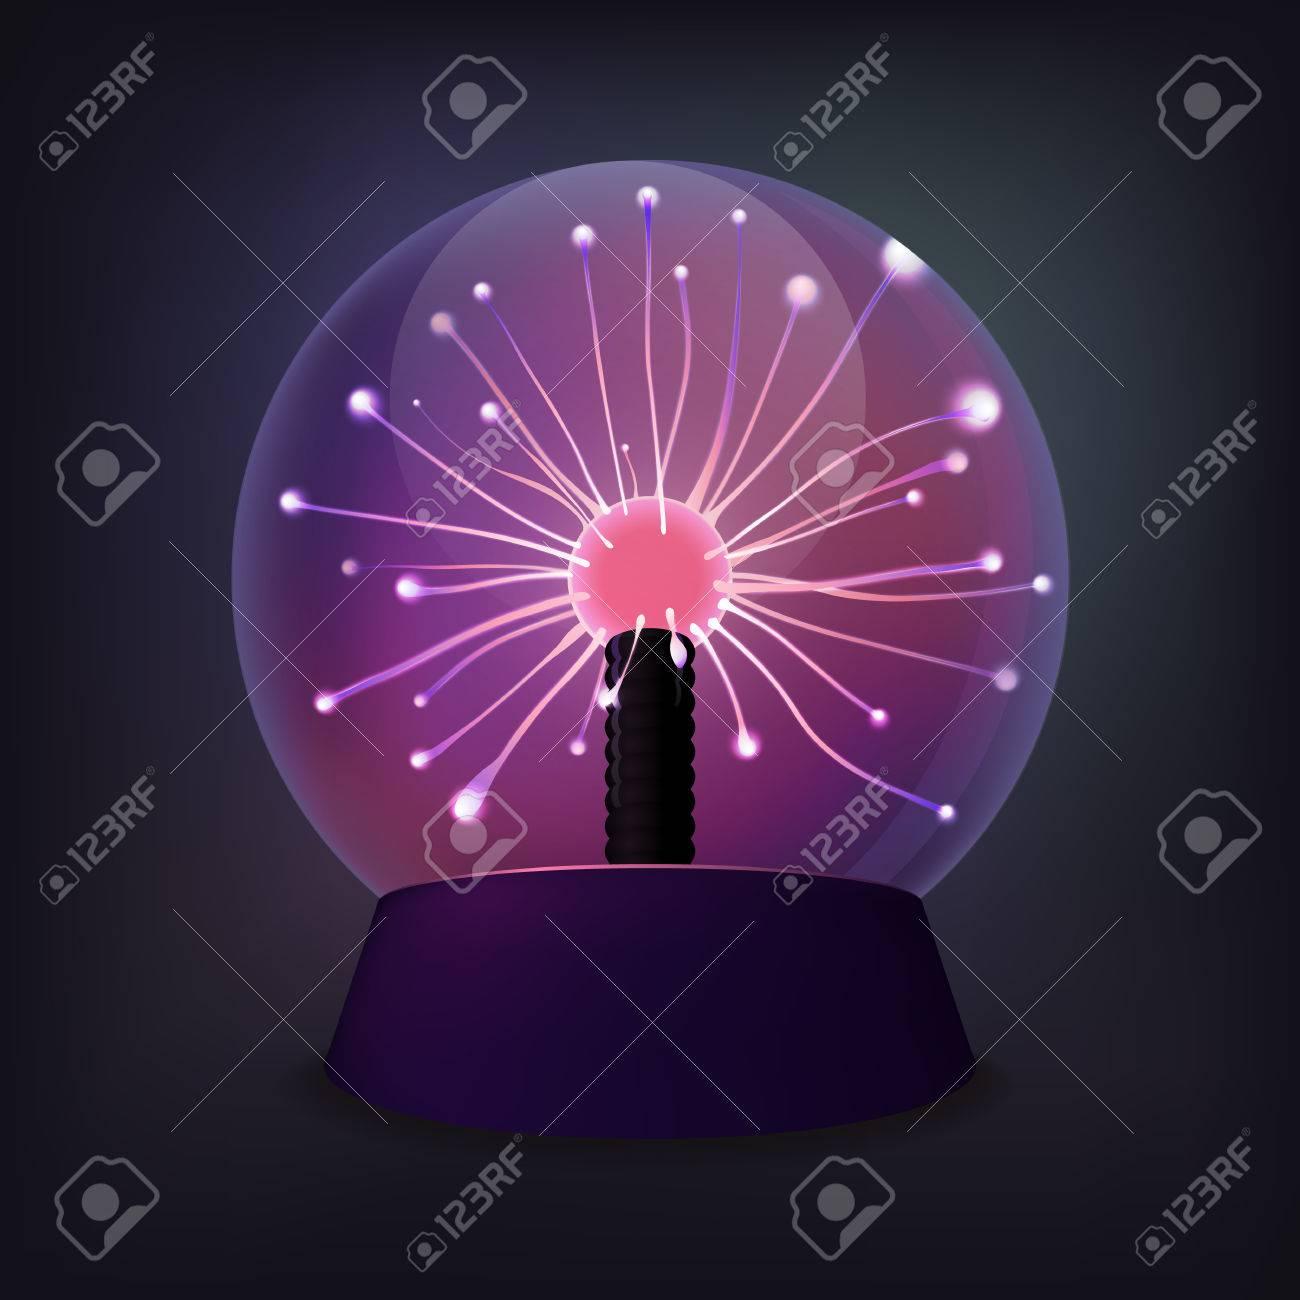 Plasma ball with luminous flames.